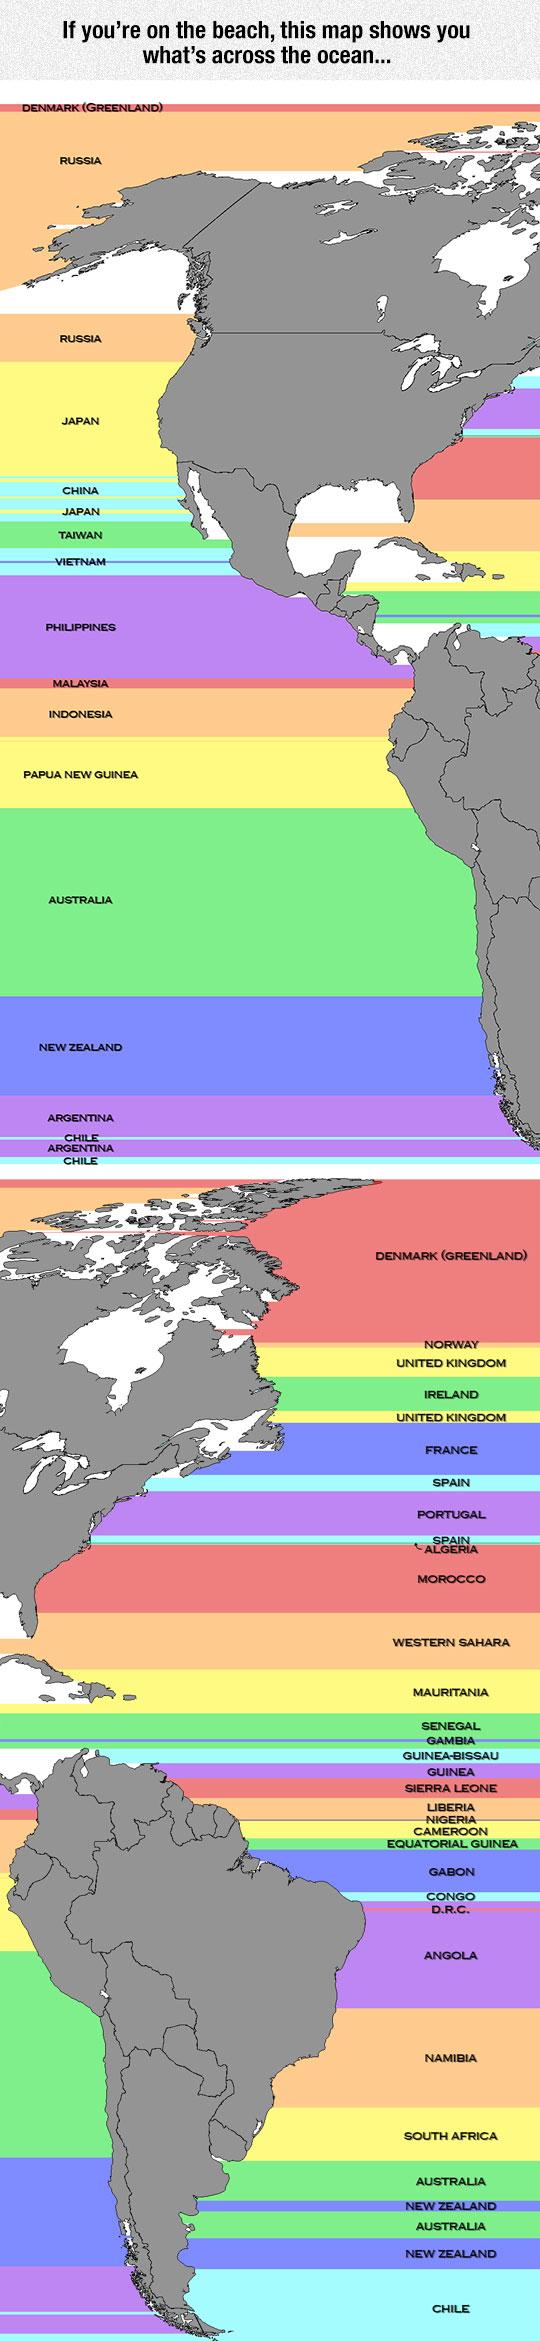 cool-American-map-beach-shore-countries